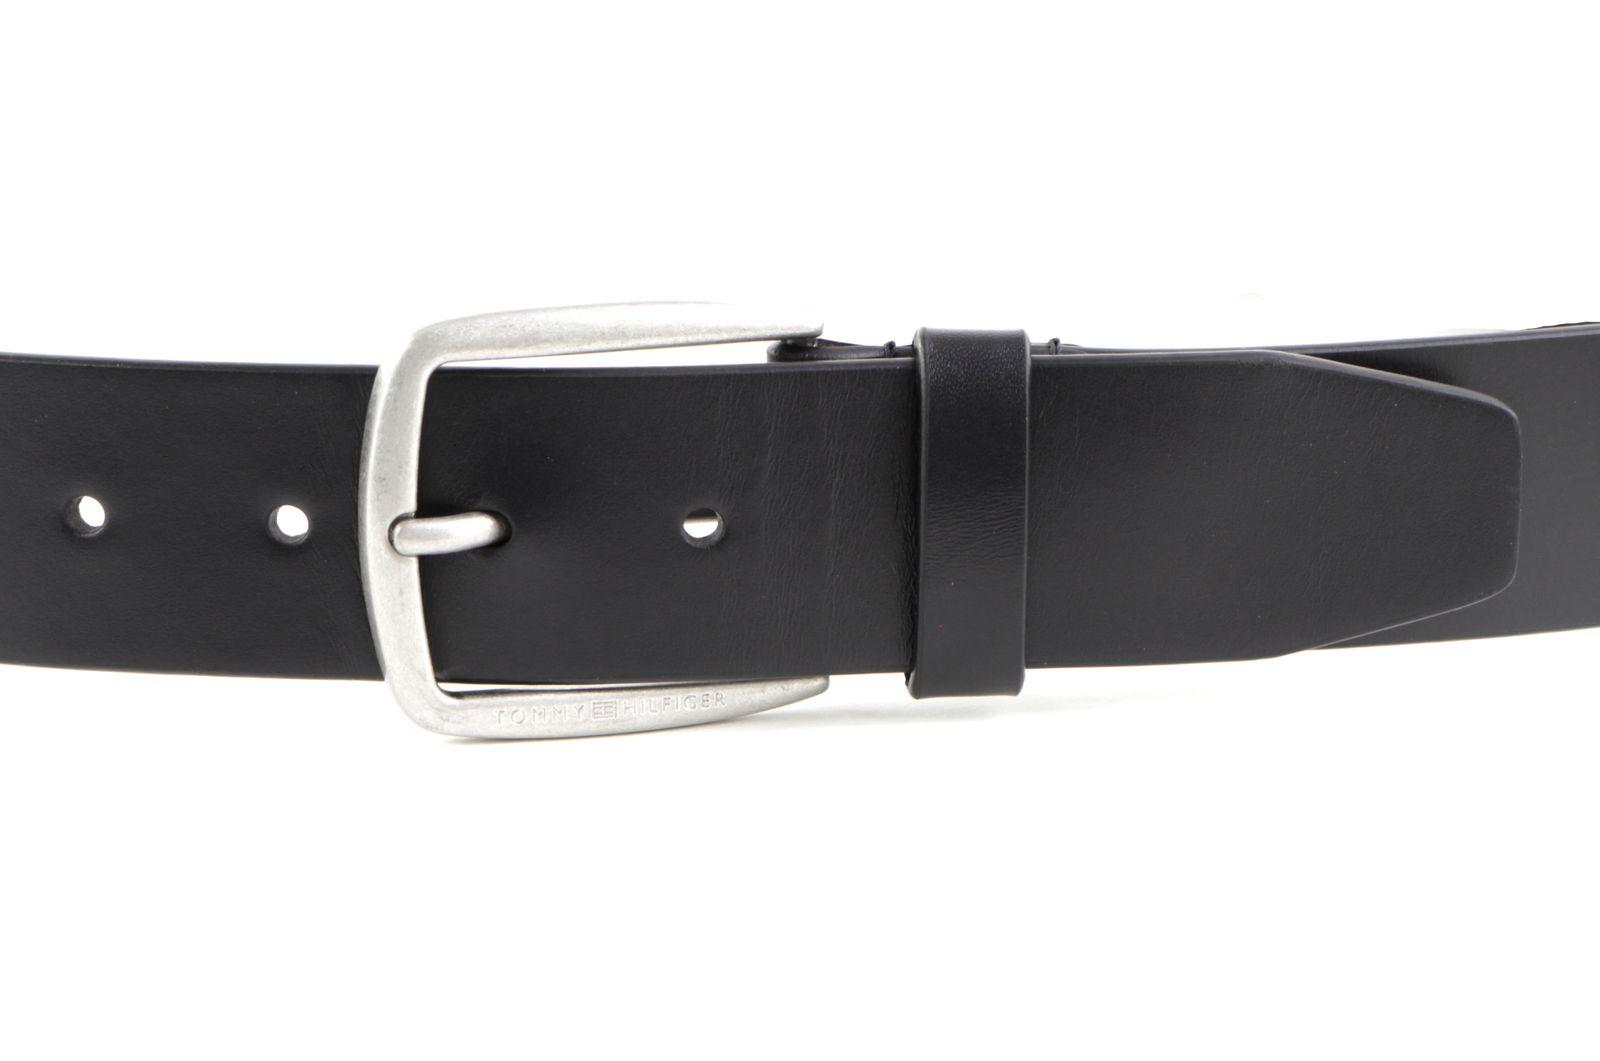 TOMMY HILFIGER Modern Leather Belt 4.0 W105 Black